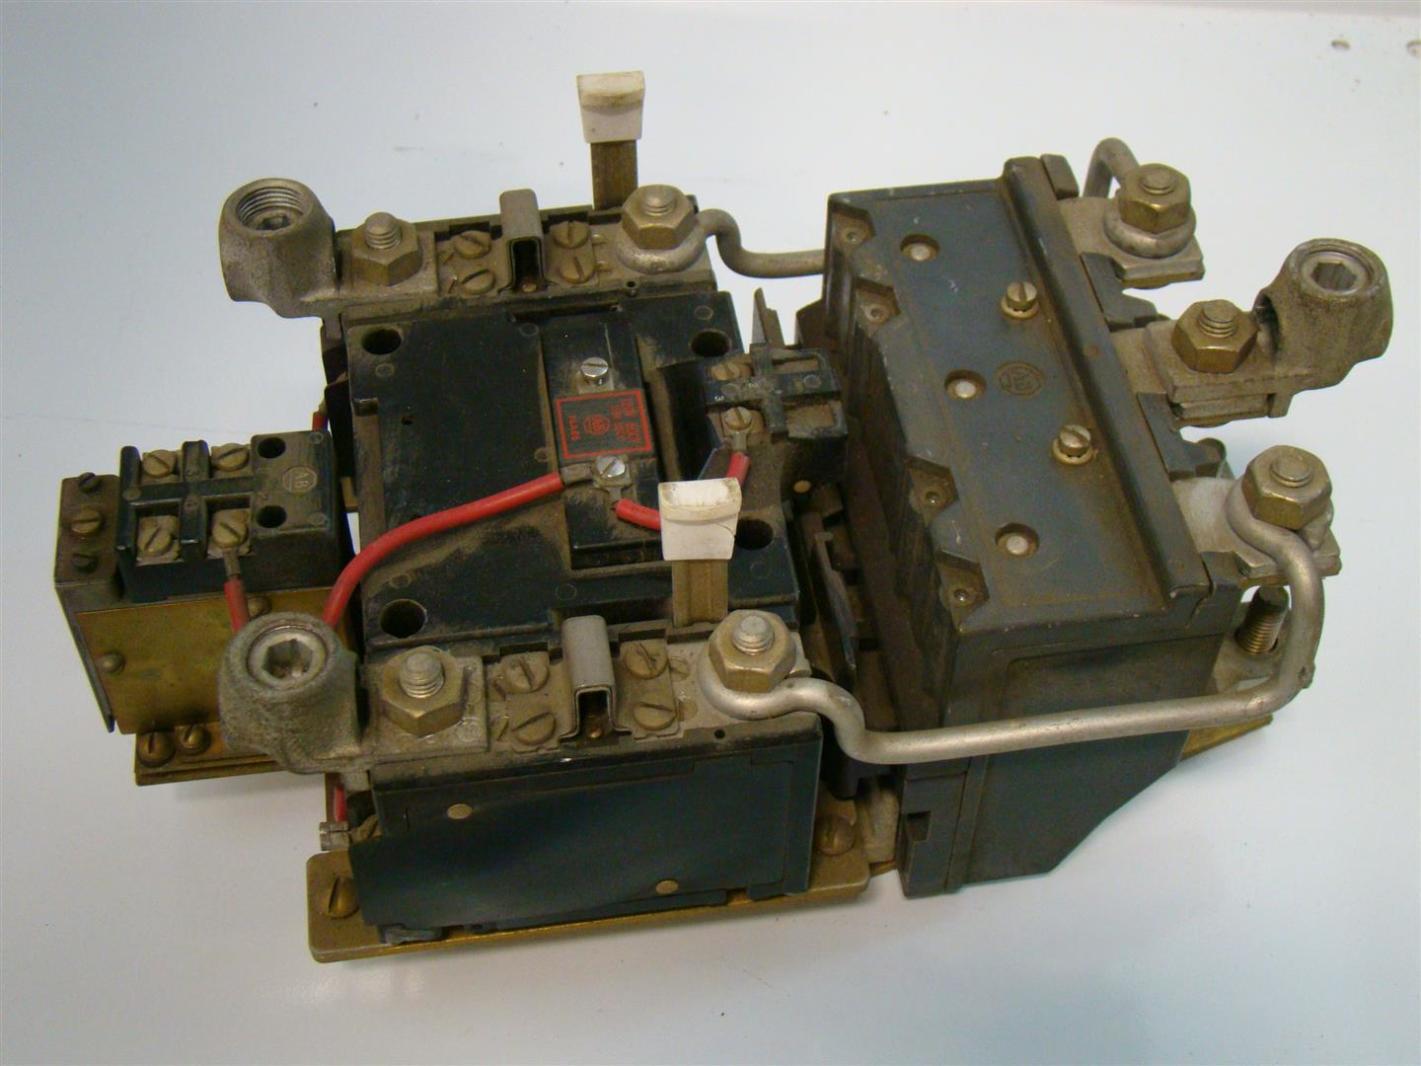 Ab 3 Phase Motor Starter Coil 120v 74a86 Joseph Fazzio